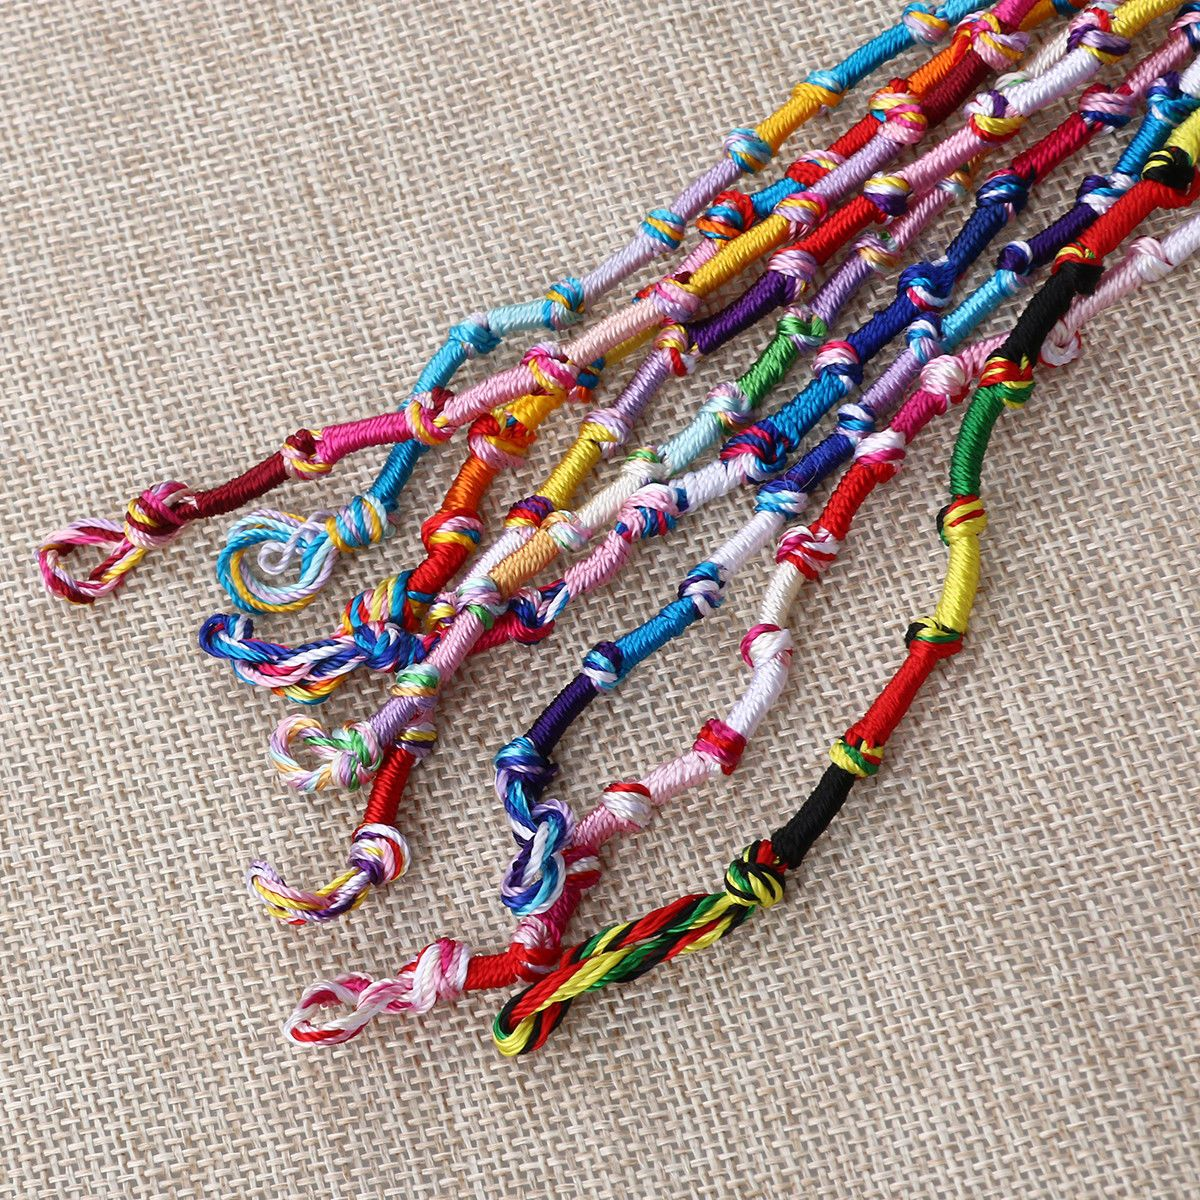 Bracelets pcs hippie style braided friendship bracelet thread girls